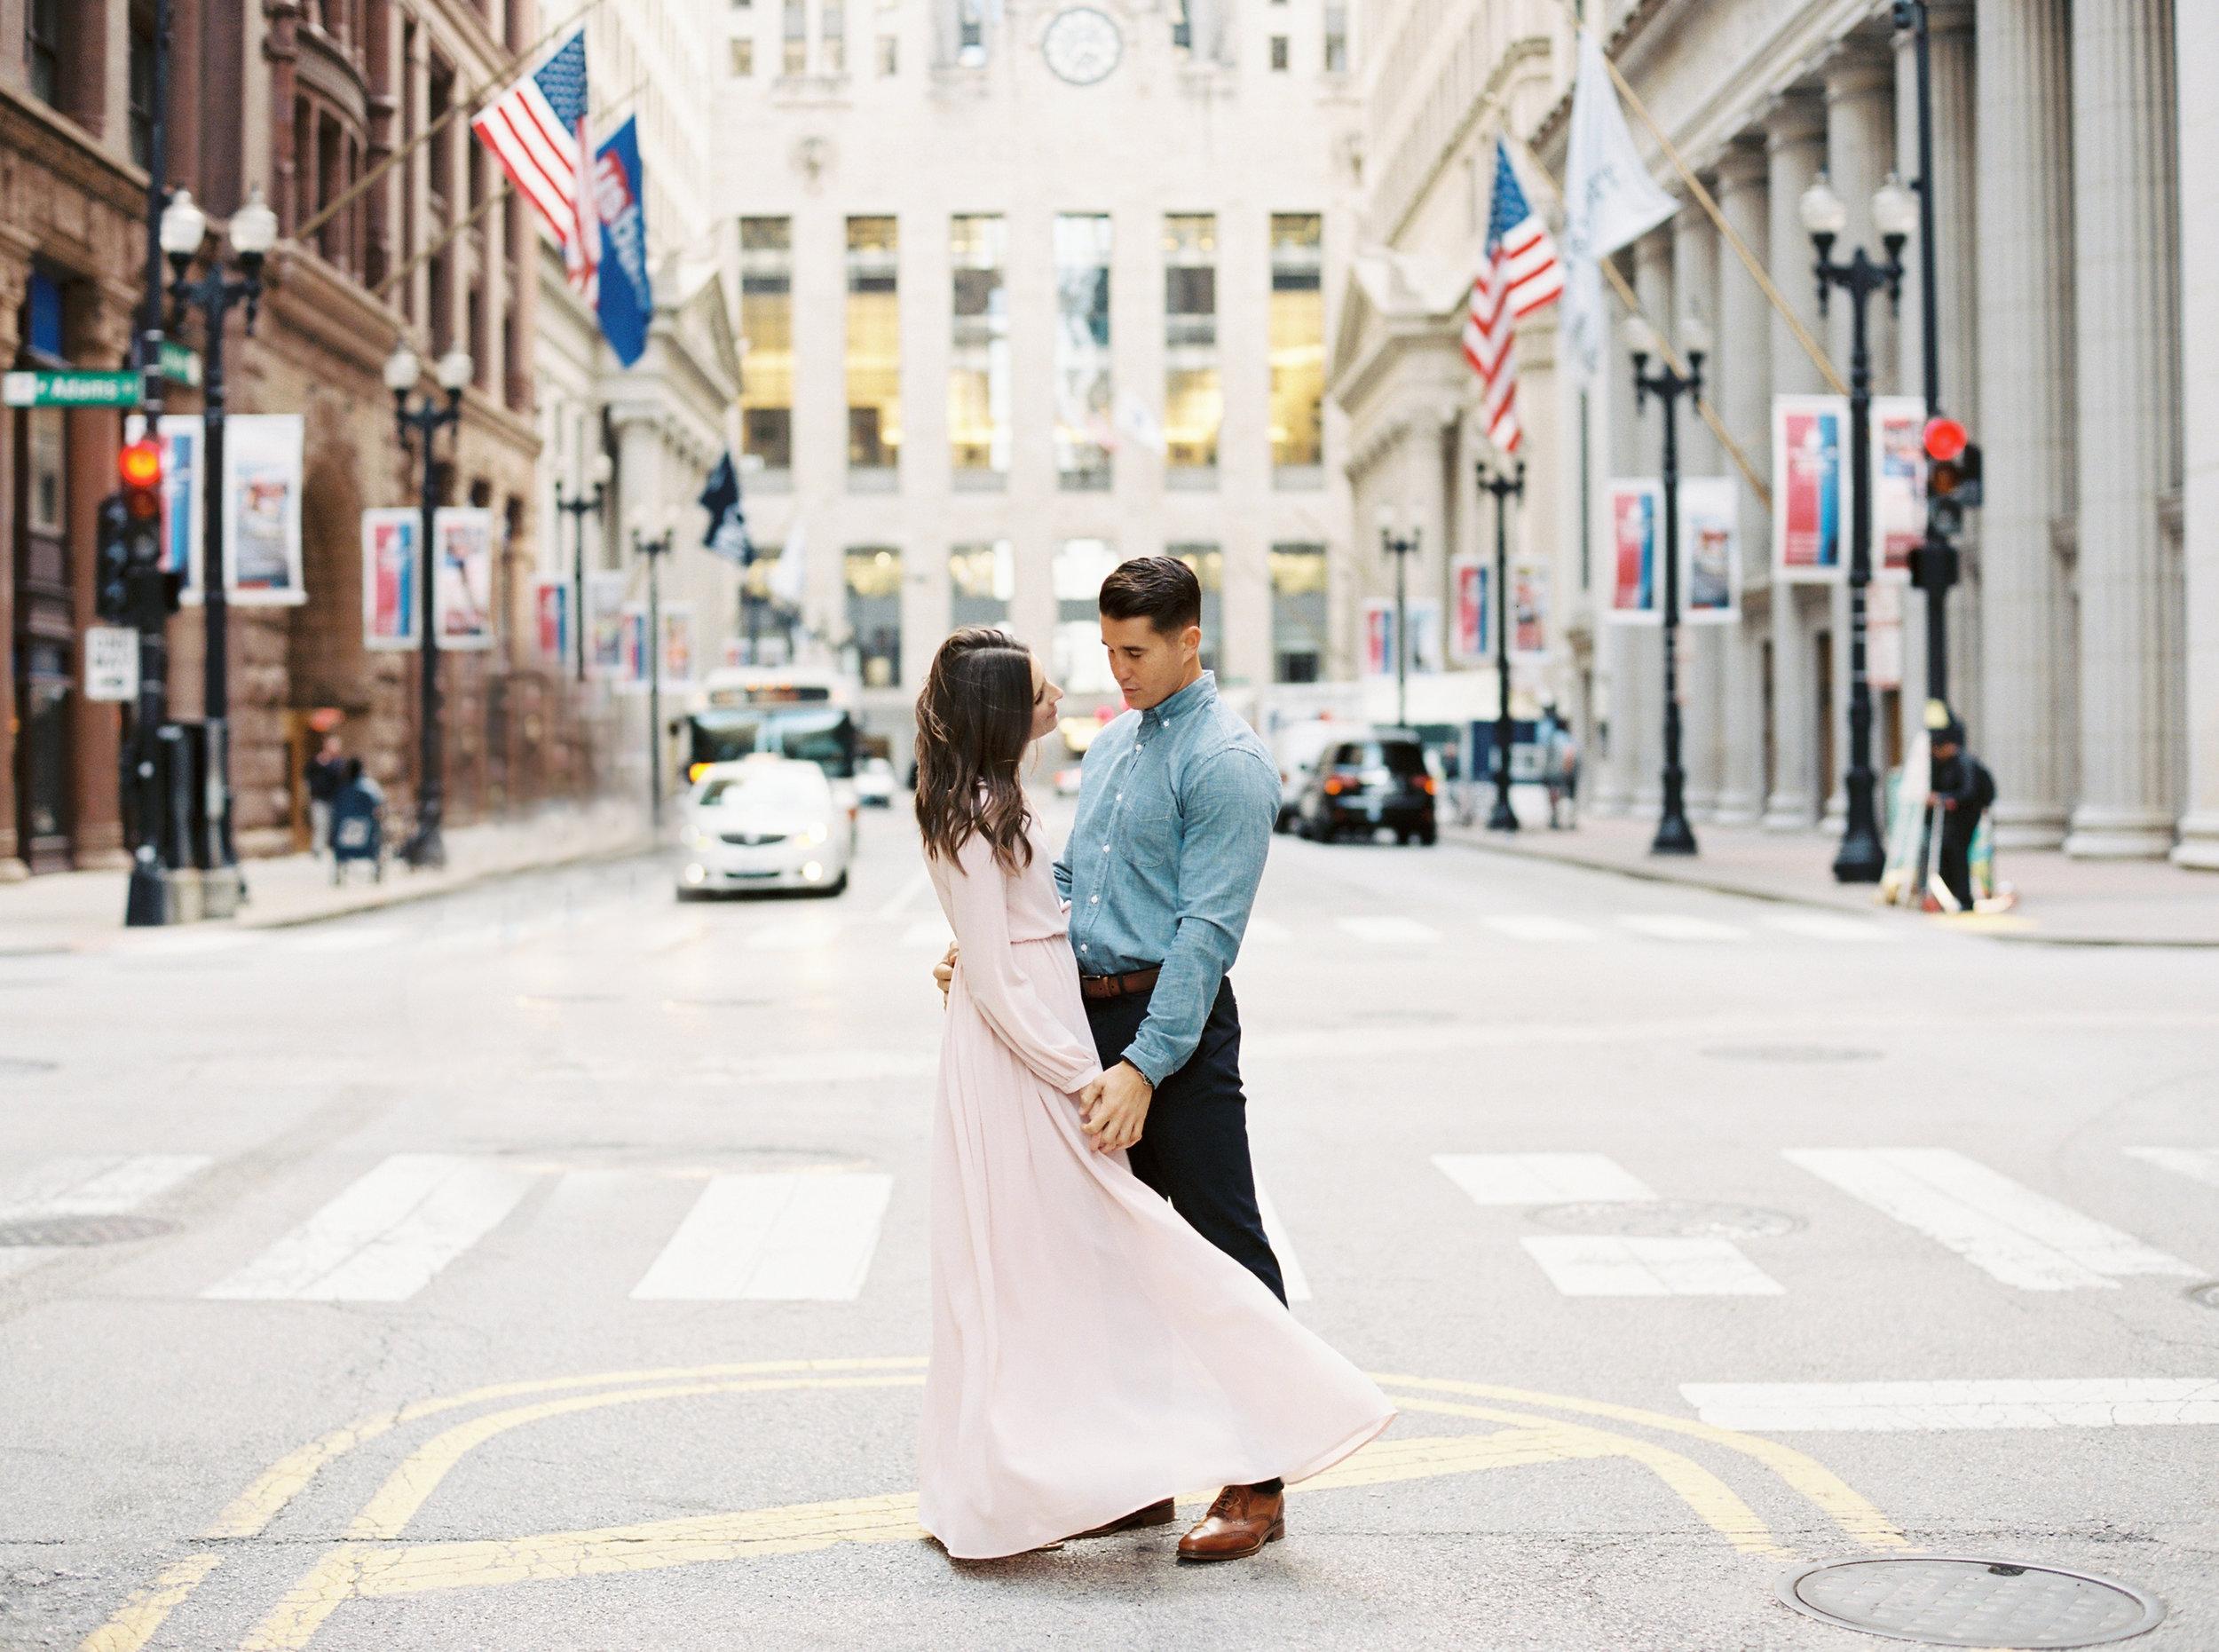 Kyle John l Fine Art Wedding Photography l Chicago, Copenhagen, California, New York, Destination l Blog l Alexis & Michael_Chicago_16